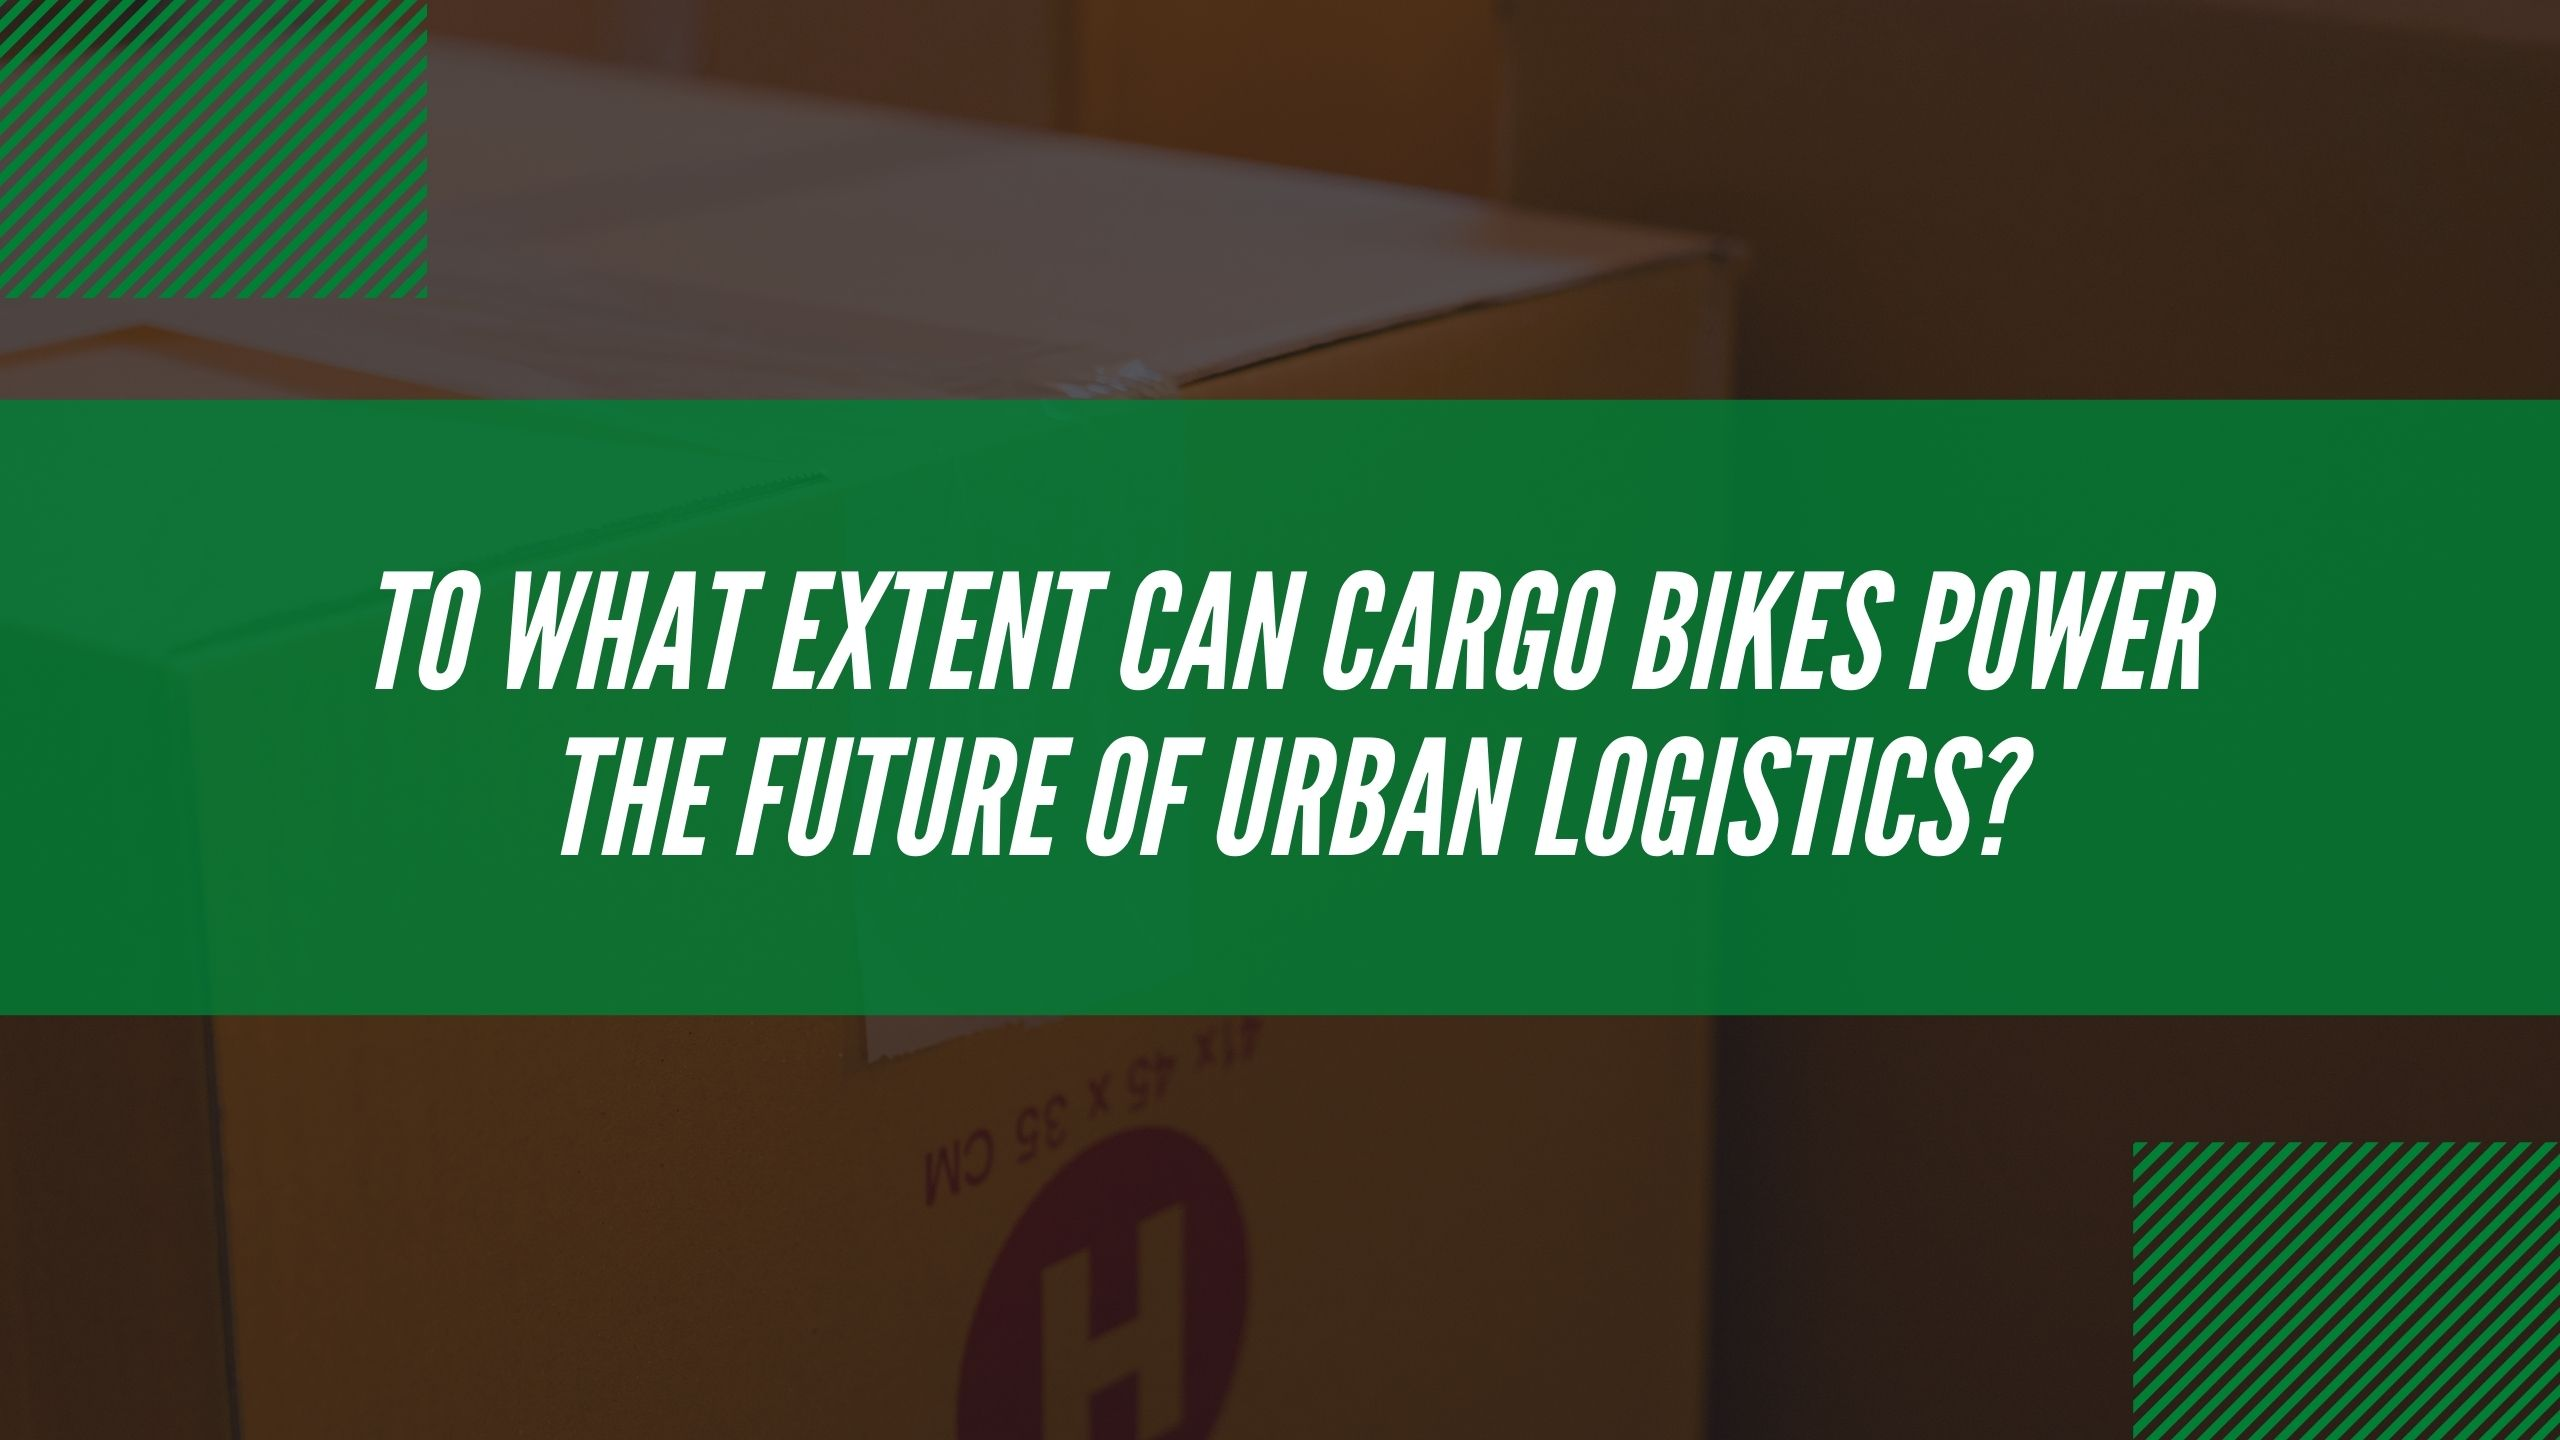 Can cargo bikes power the urban logistics of tomorrow?